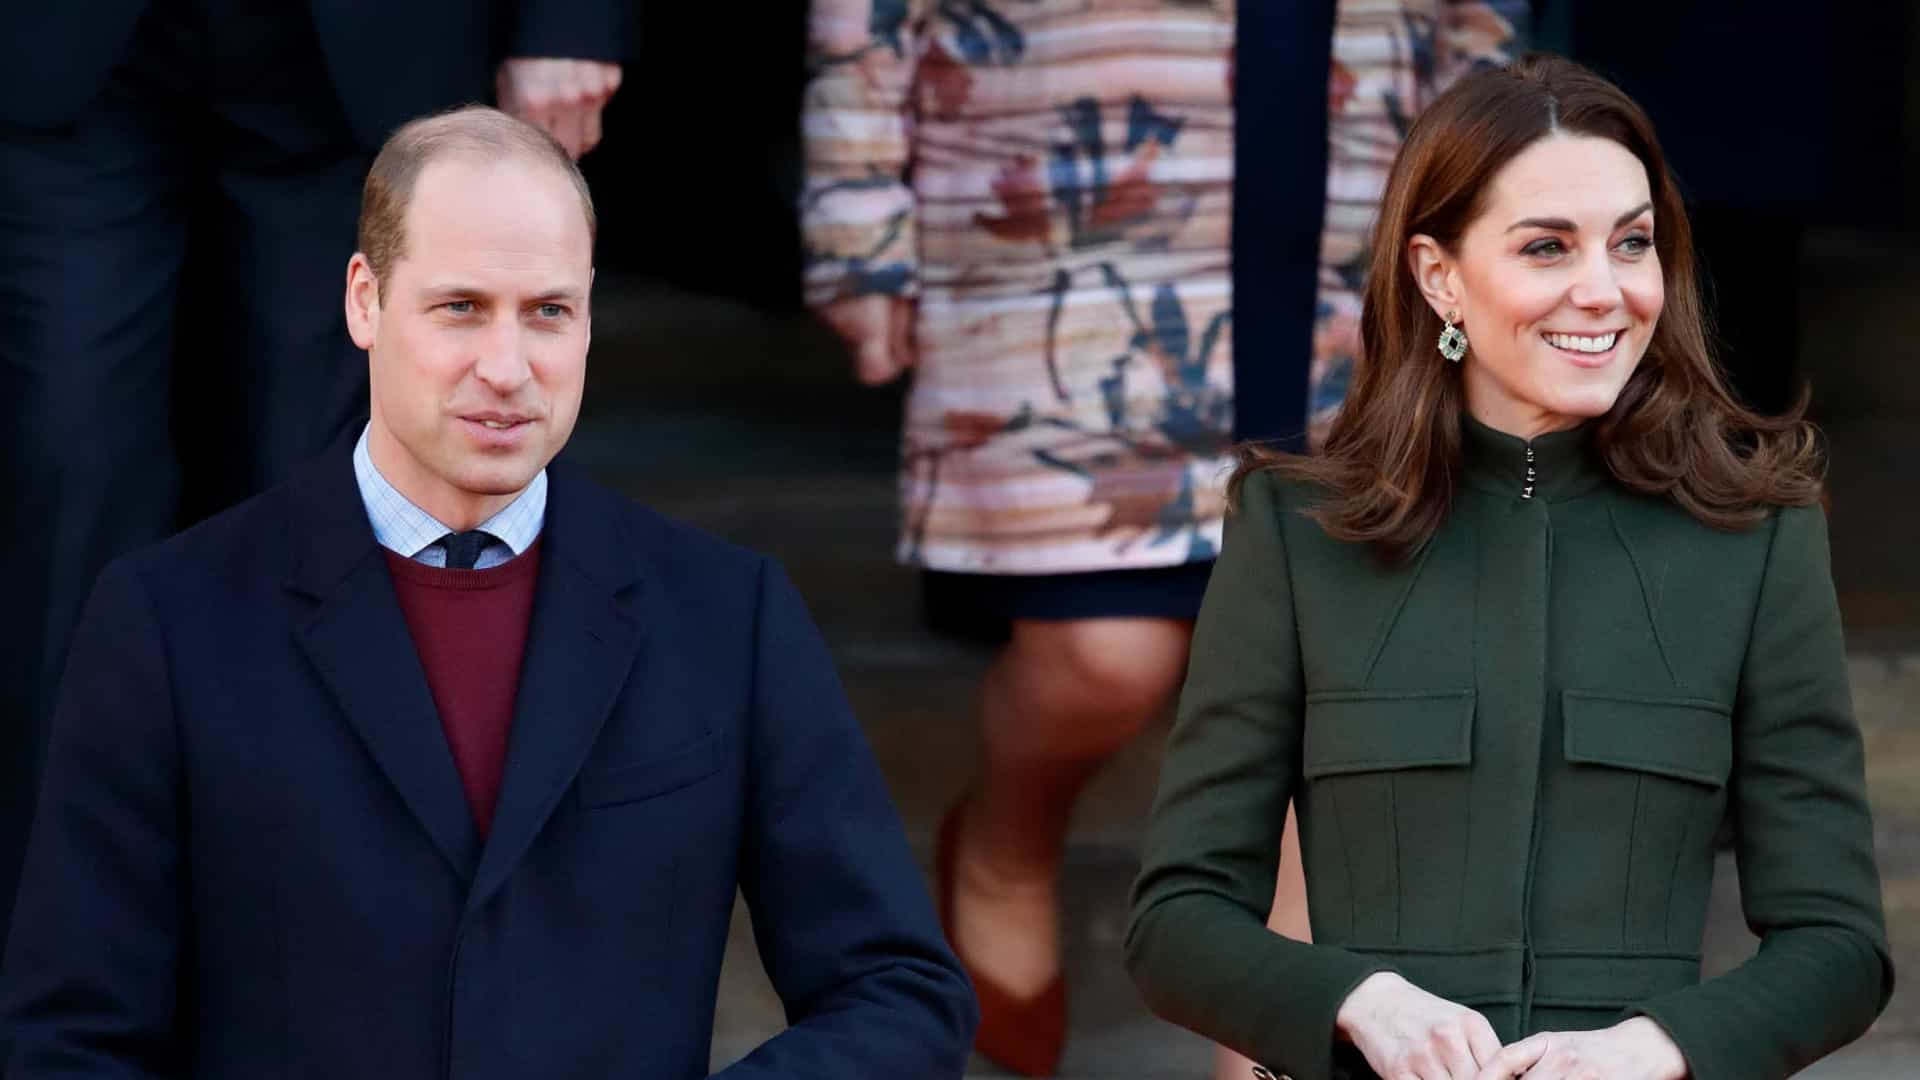 Vídeo viral: Príncipe William surpreende ao falar em língua gestual